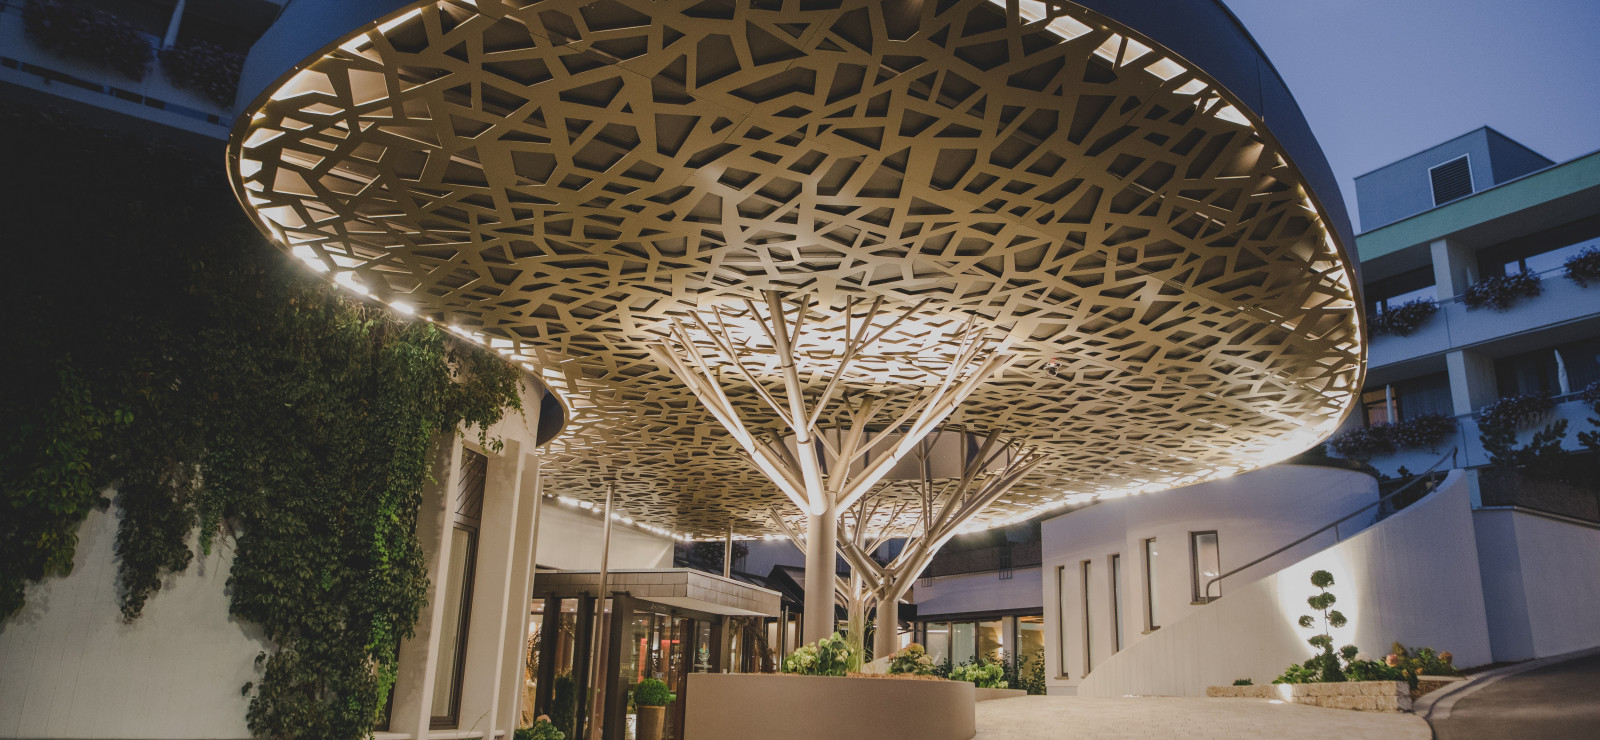 Kunzmann`s Hotel | Spa Bilder | Bild 1